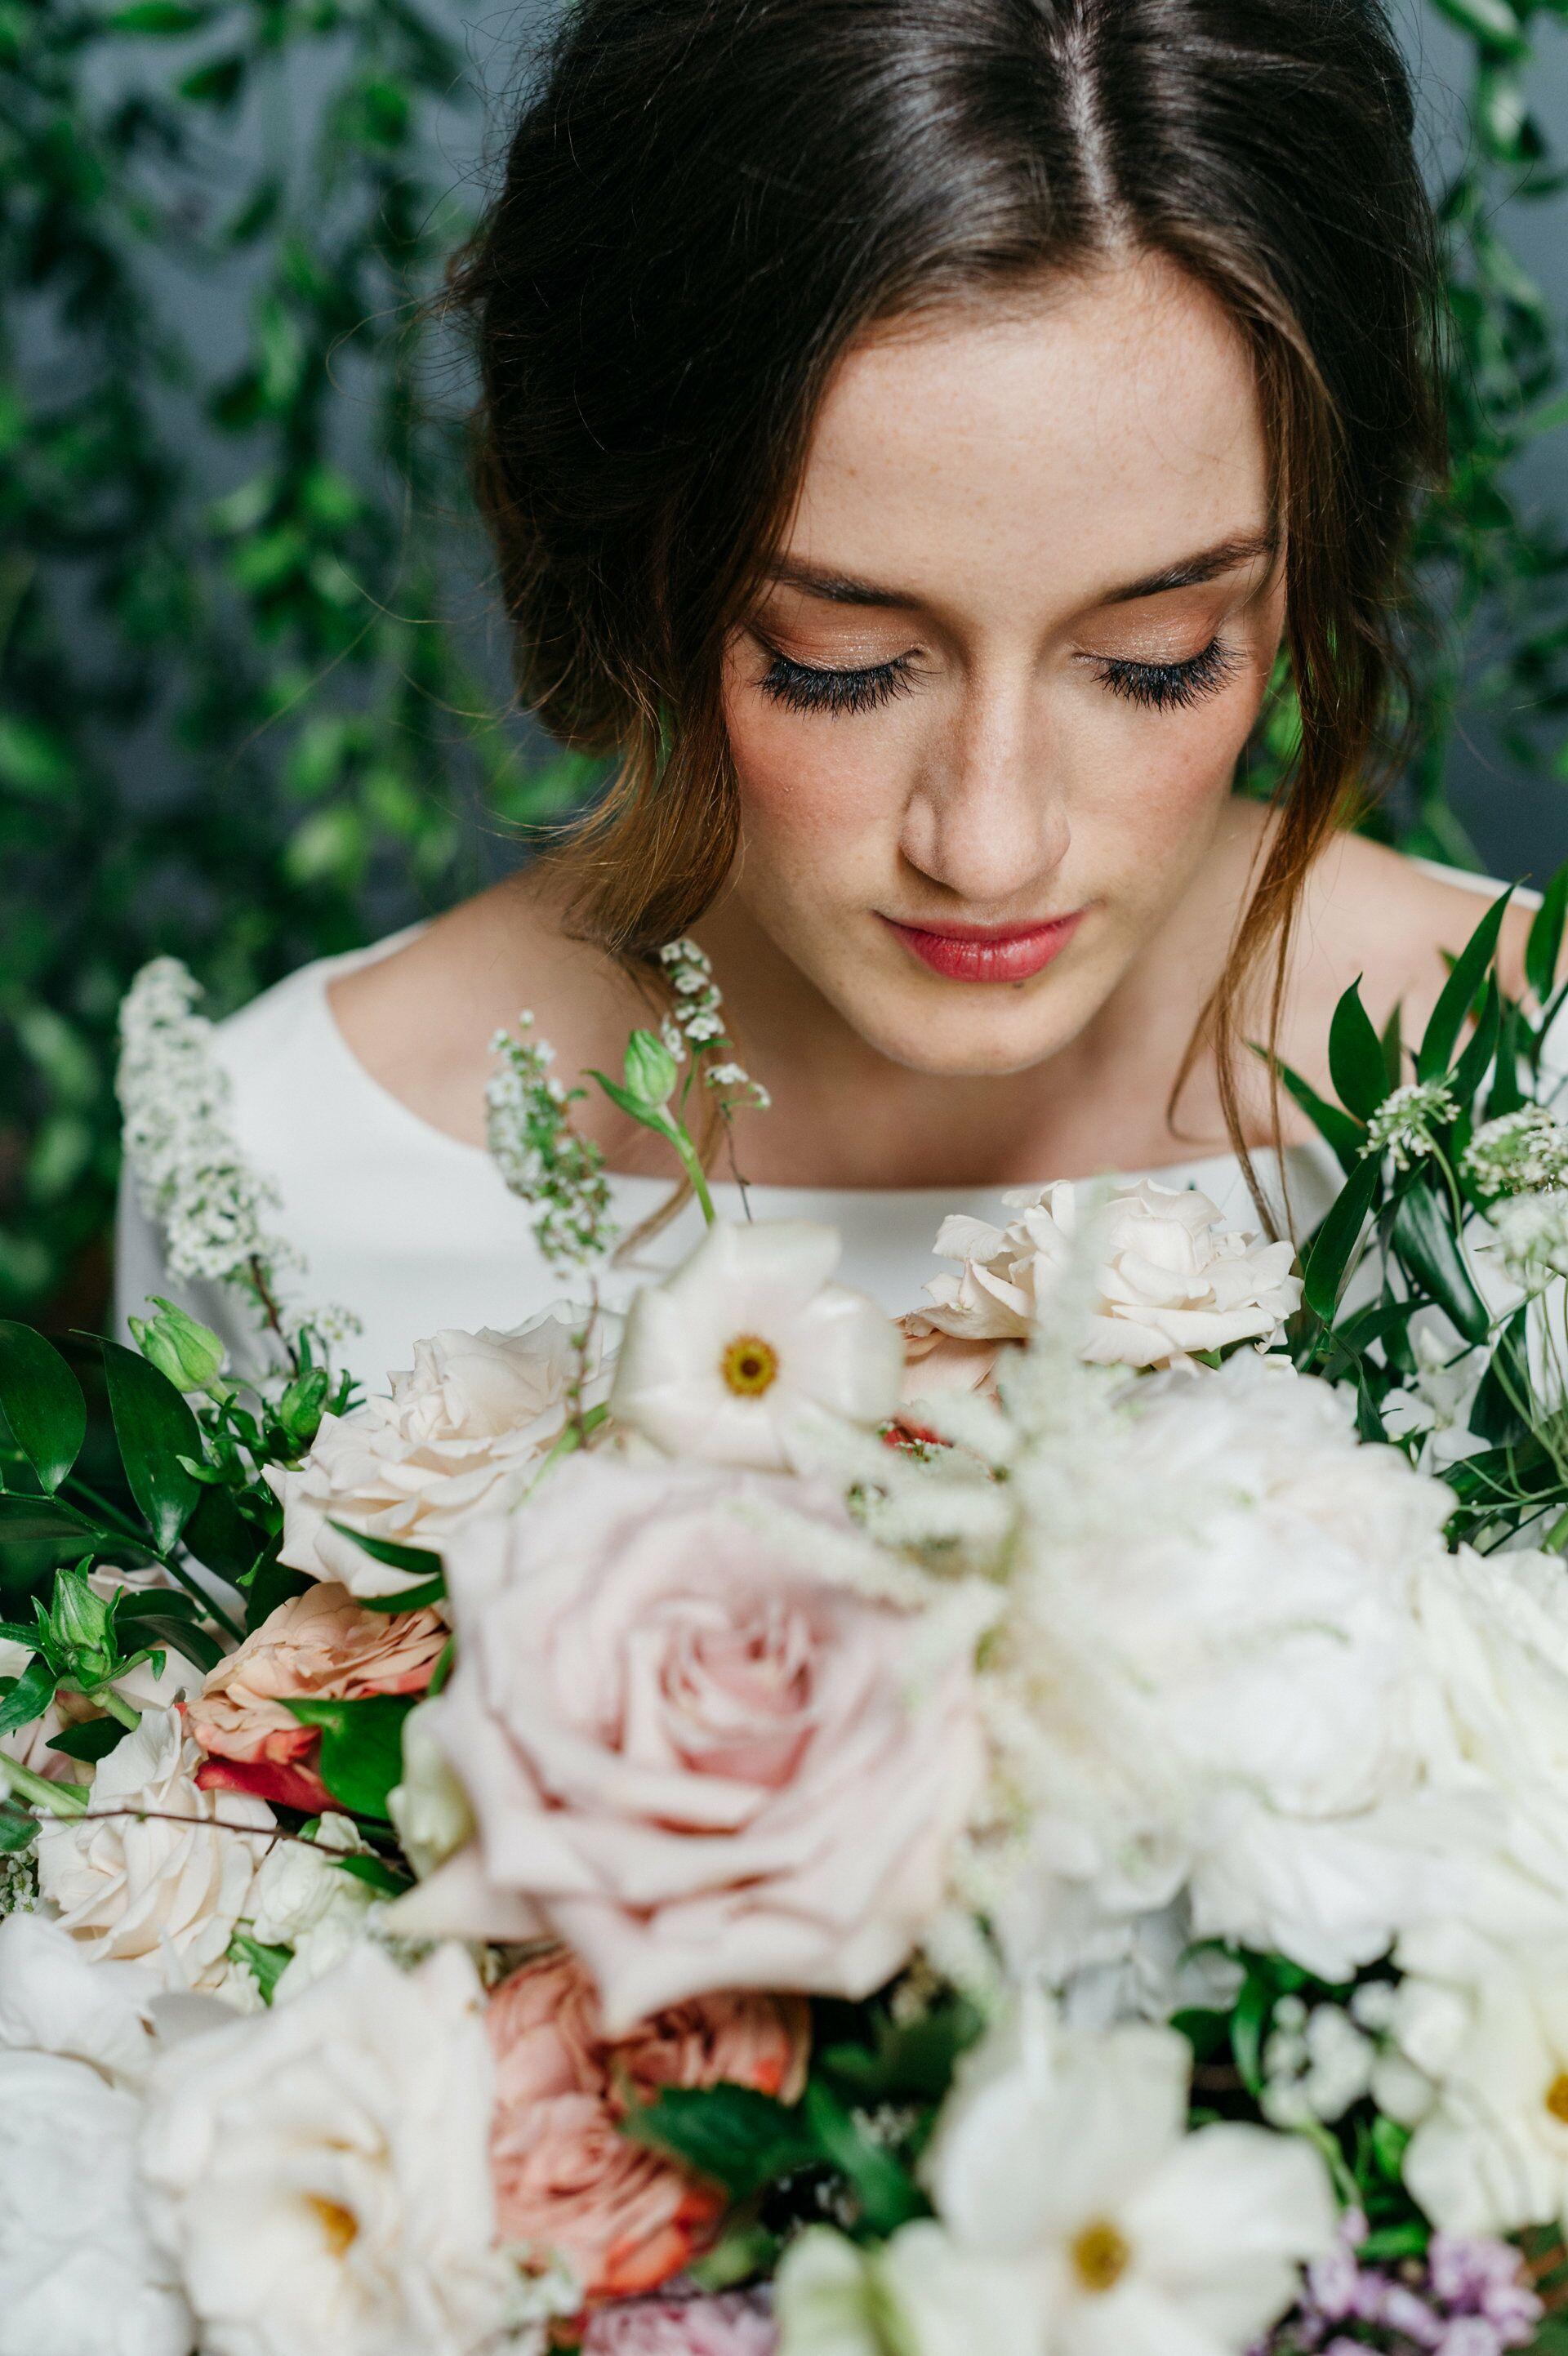 erica t. martell, makeup artist. - west hartford, ct